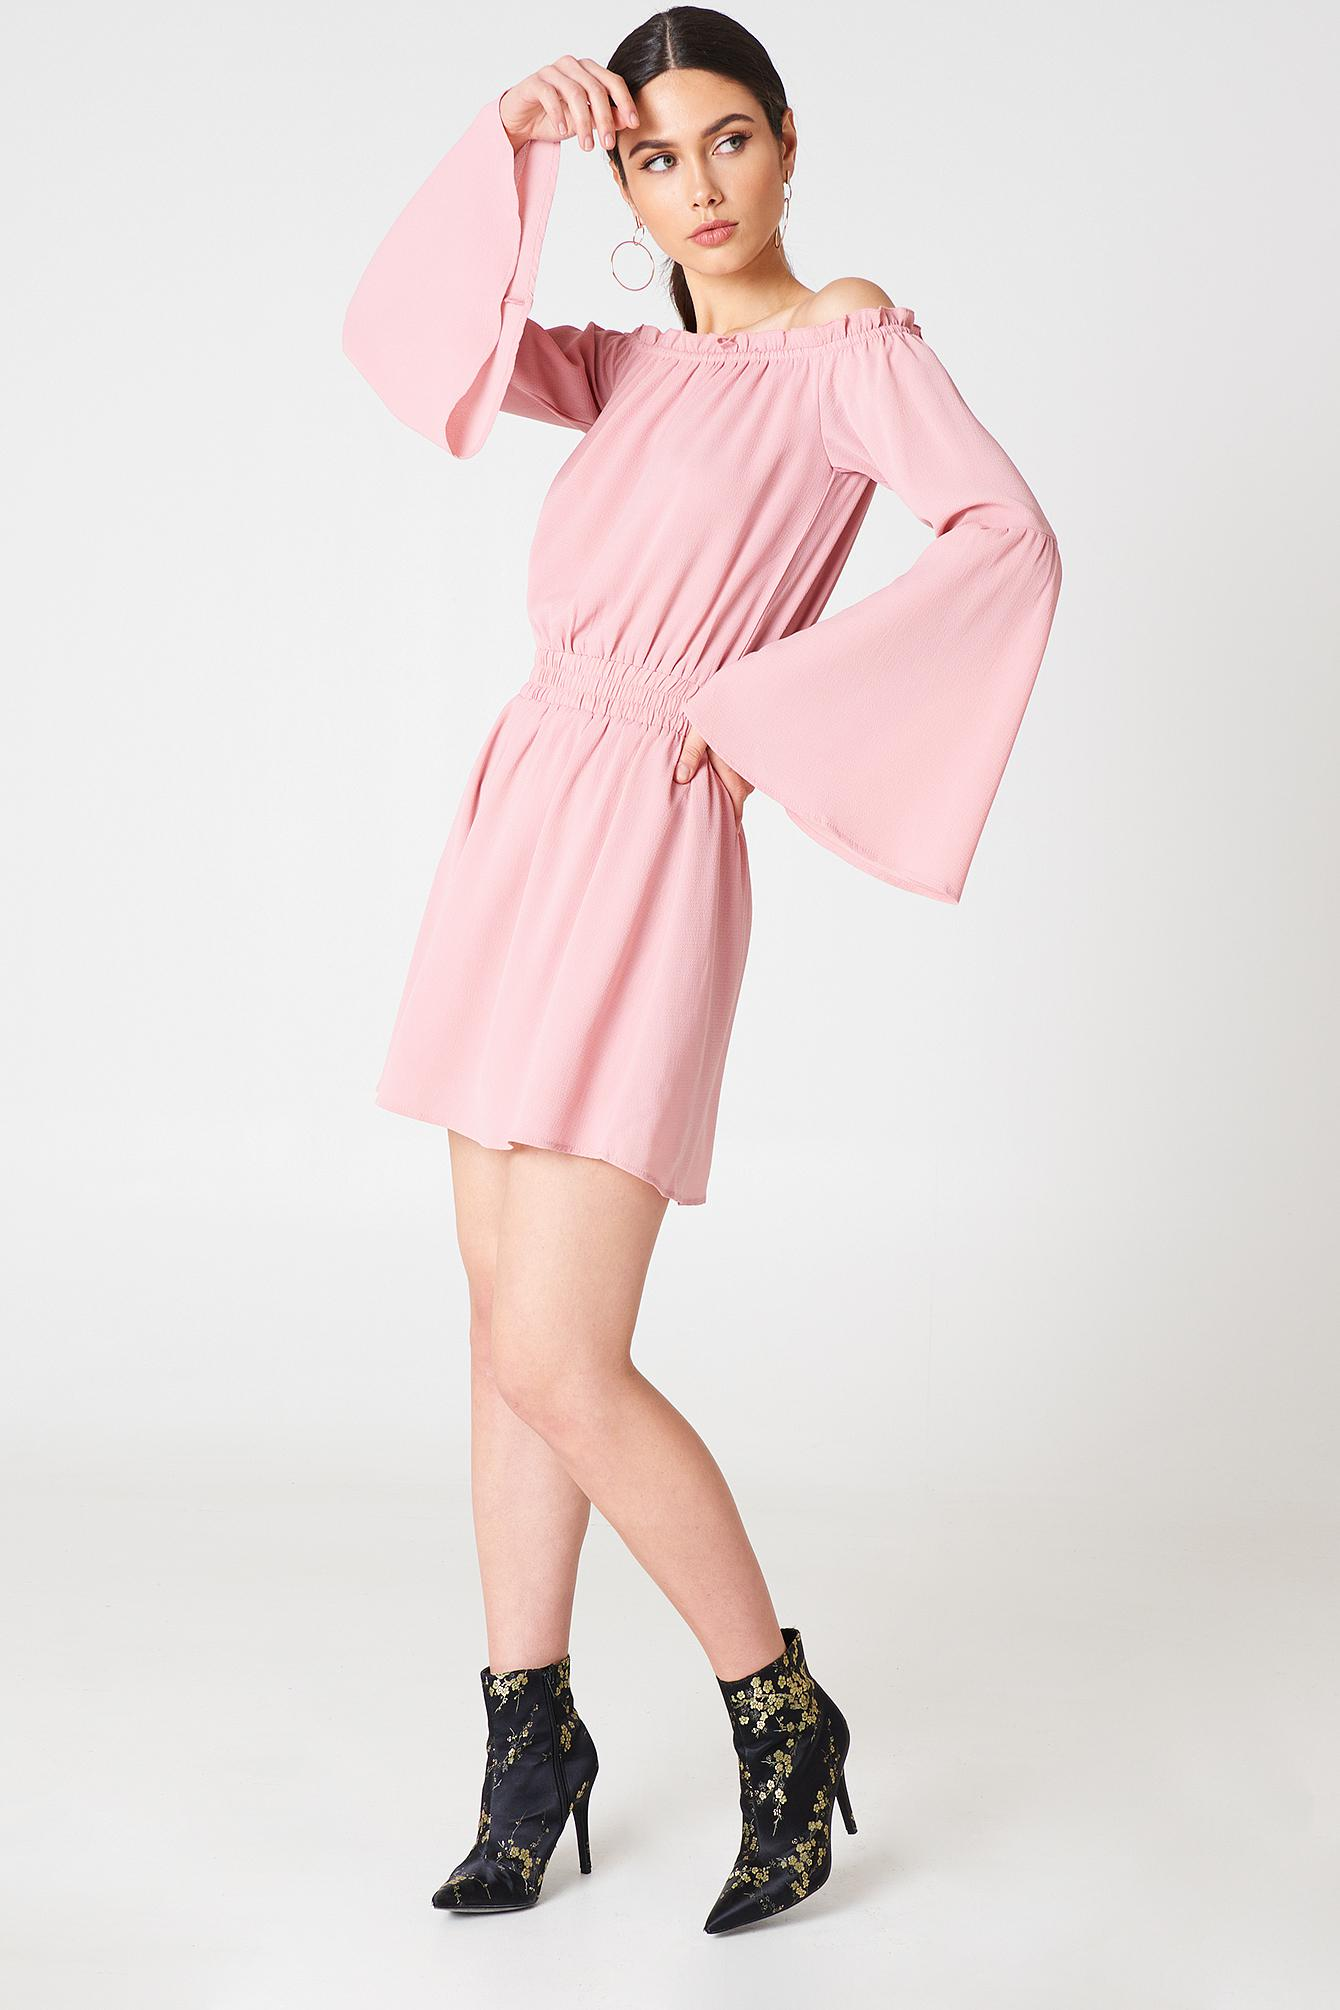 8468510fac0 NA-KD Wide Sleeve Off Shoulder Dress Light Pink in Pink - Lyst